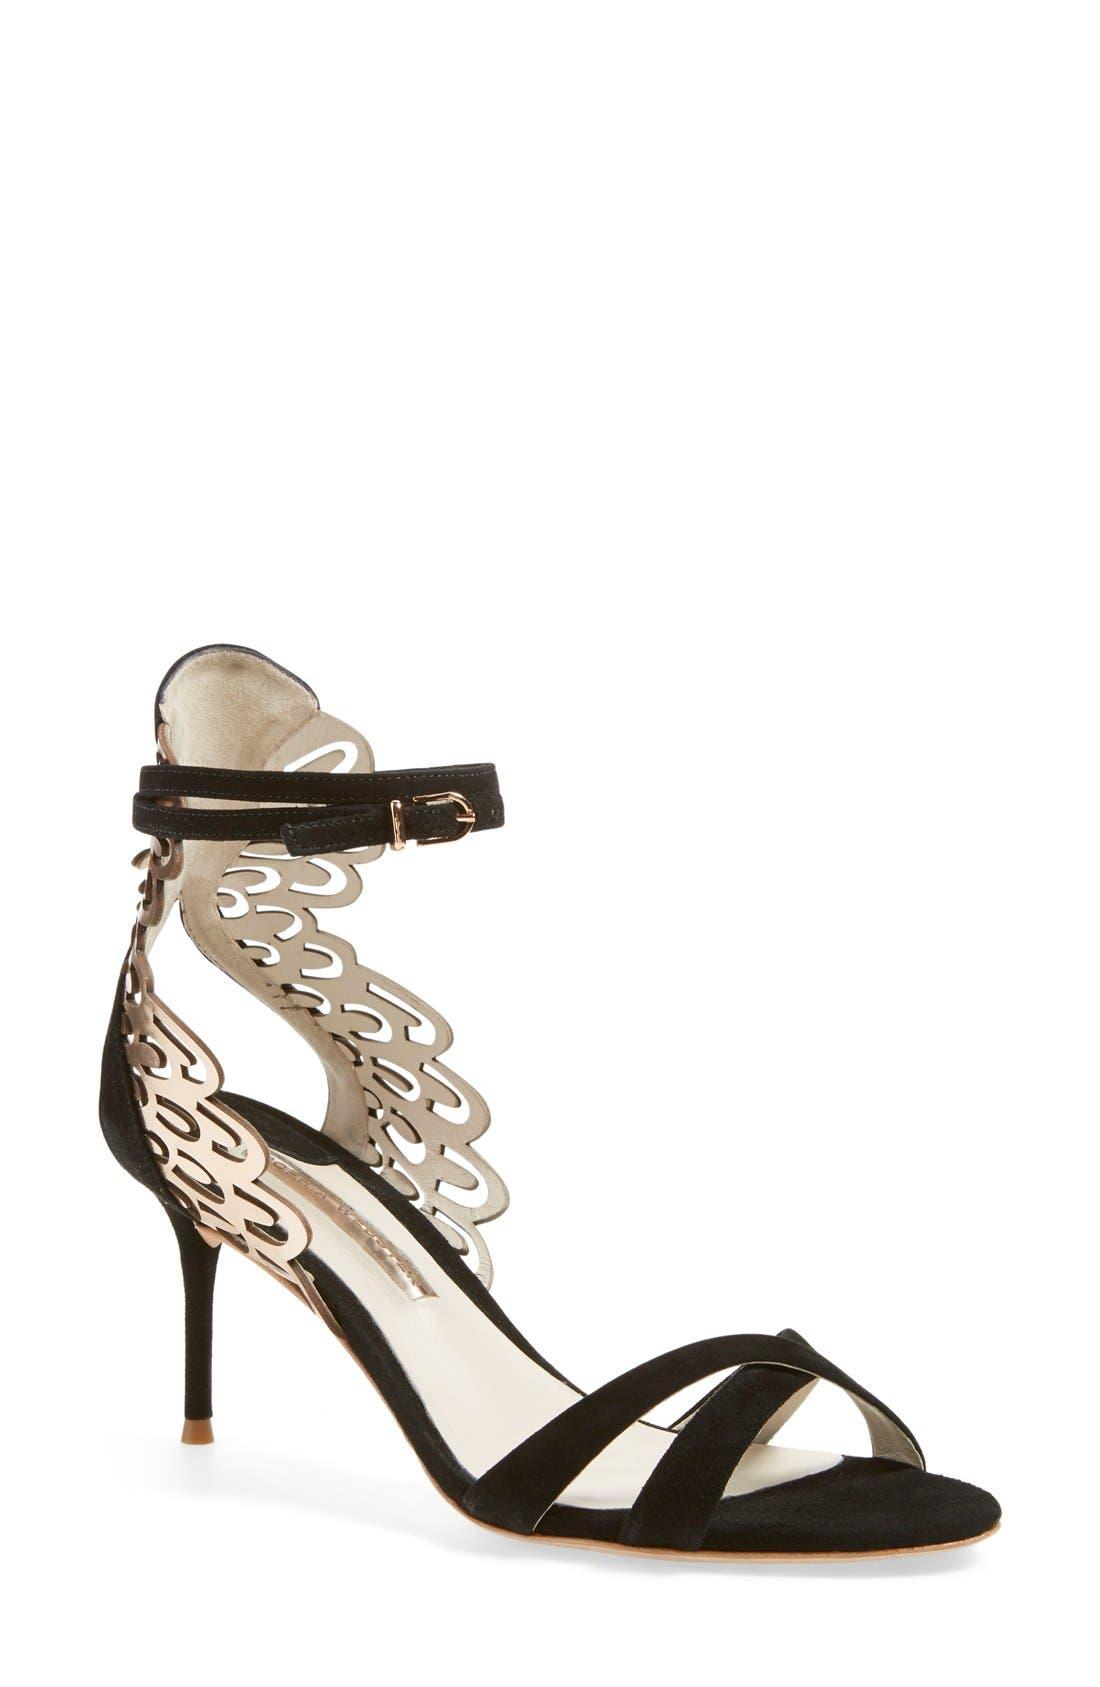 Main Image - Sophia Webster 'Micah' Ankle Strap Sandal (Women)